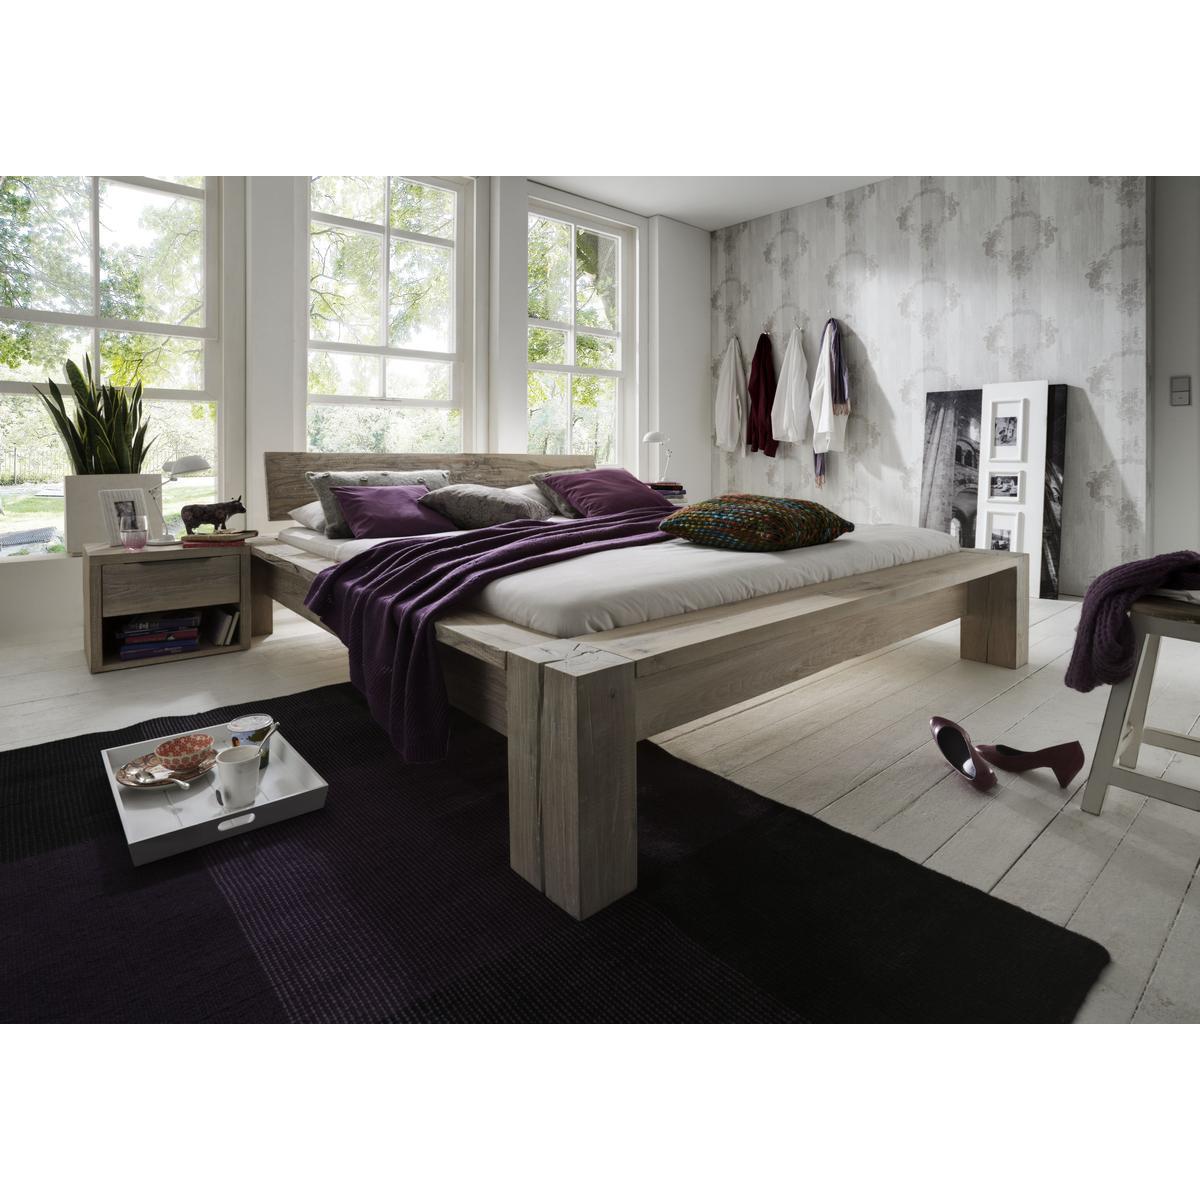 massivholz balkenbett 180x200 heavy sleep capri wildeiche. Black Bedroom Furniture Sets. Home Design Ideas